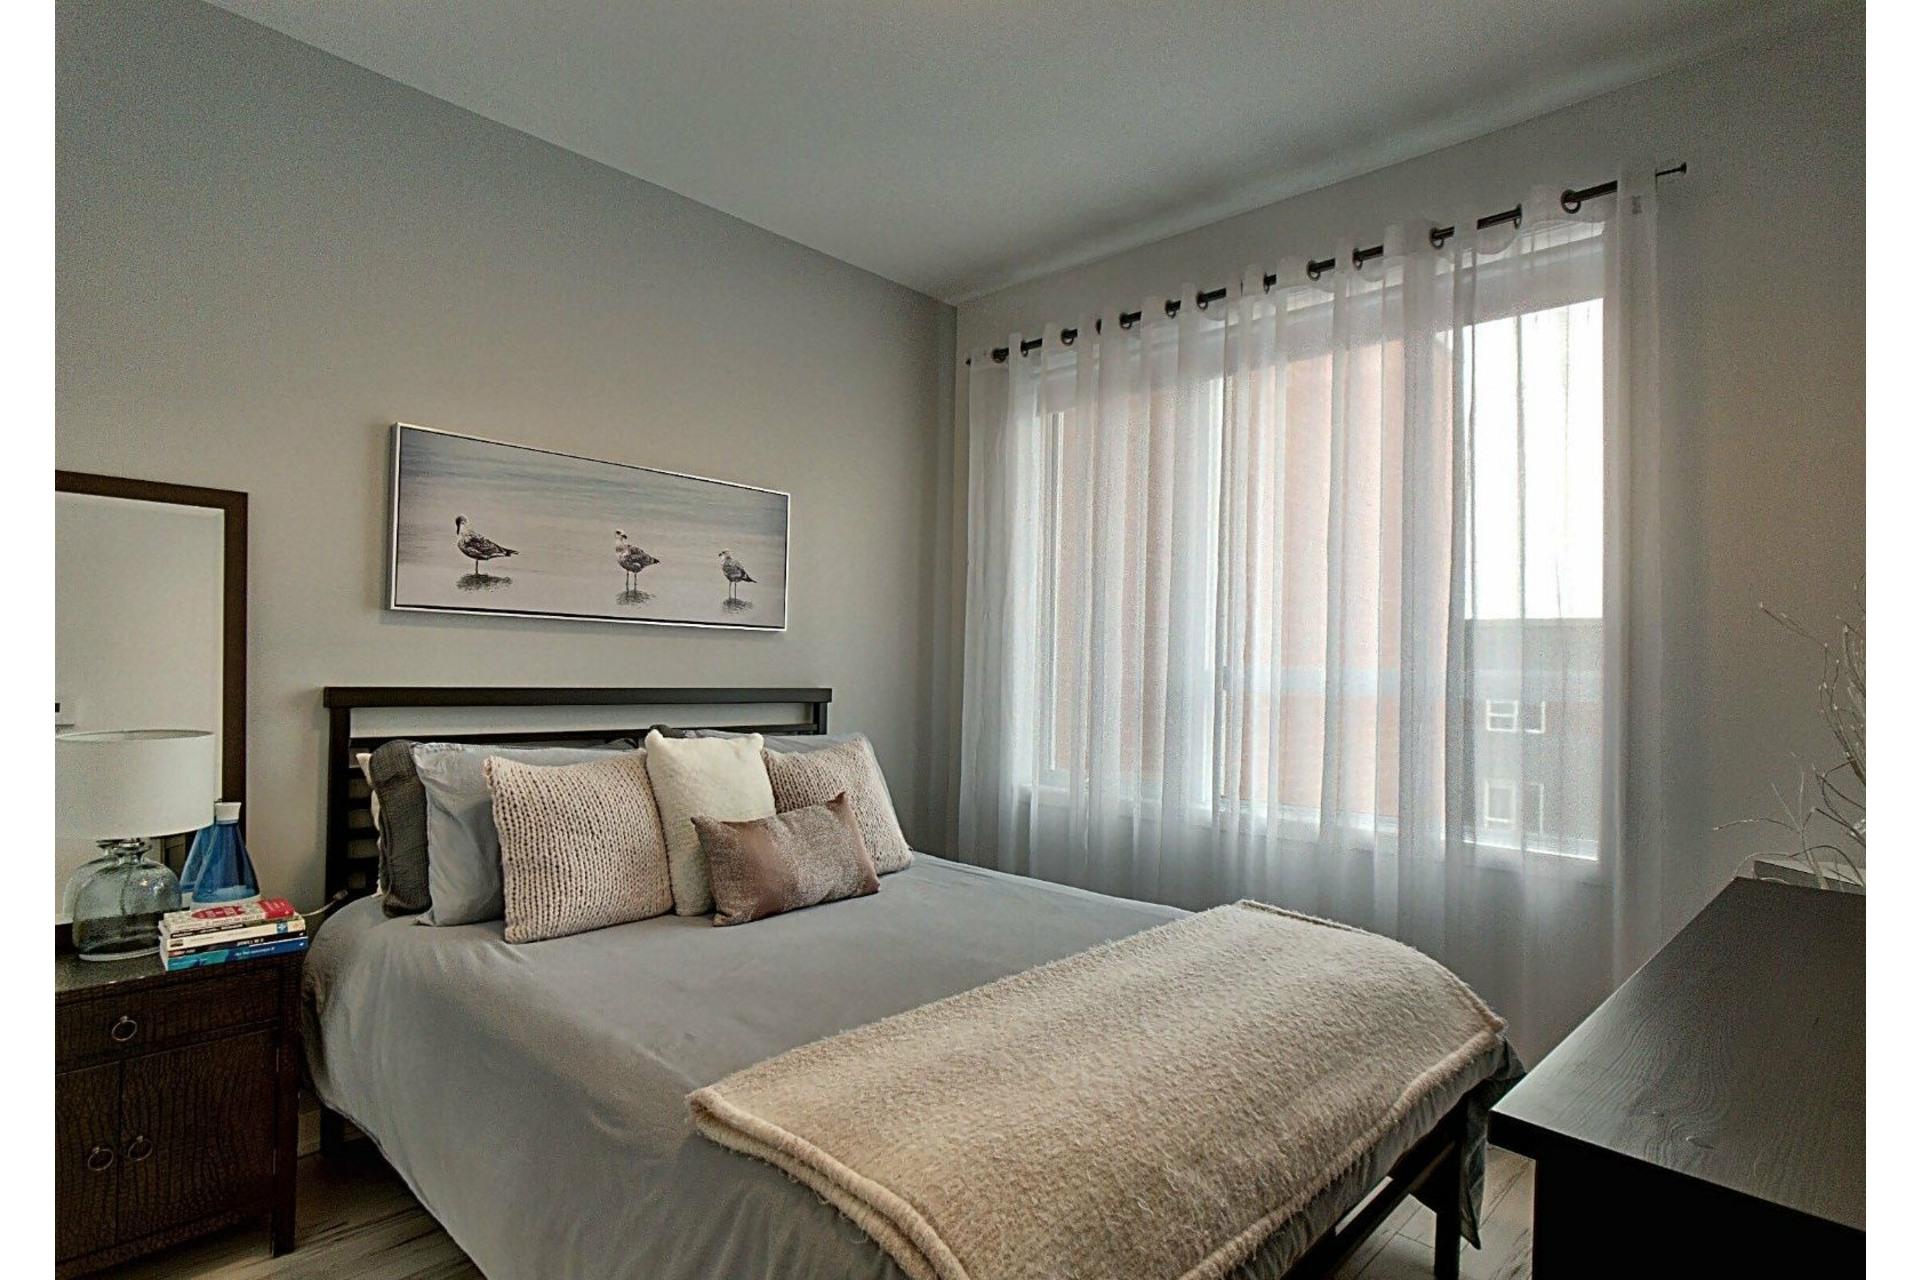 image 3 - Apartment For sale Saint-Lambert - 6 rooms